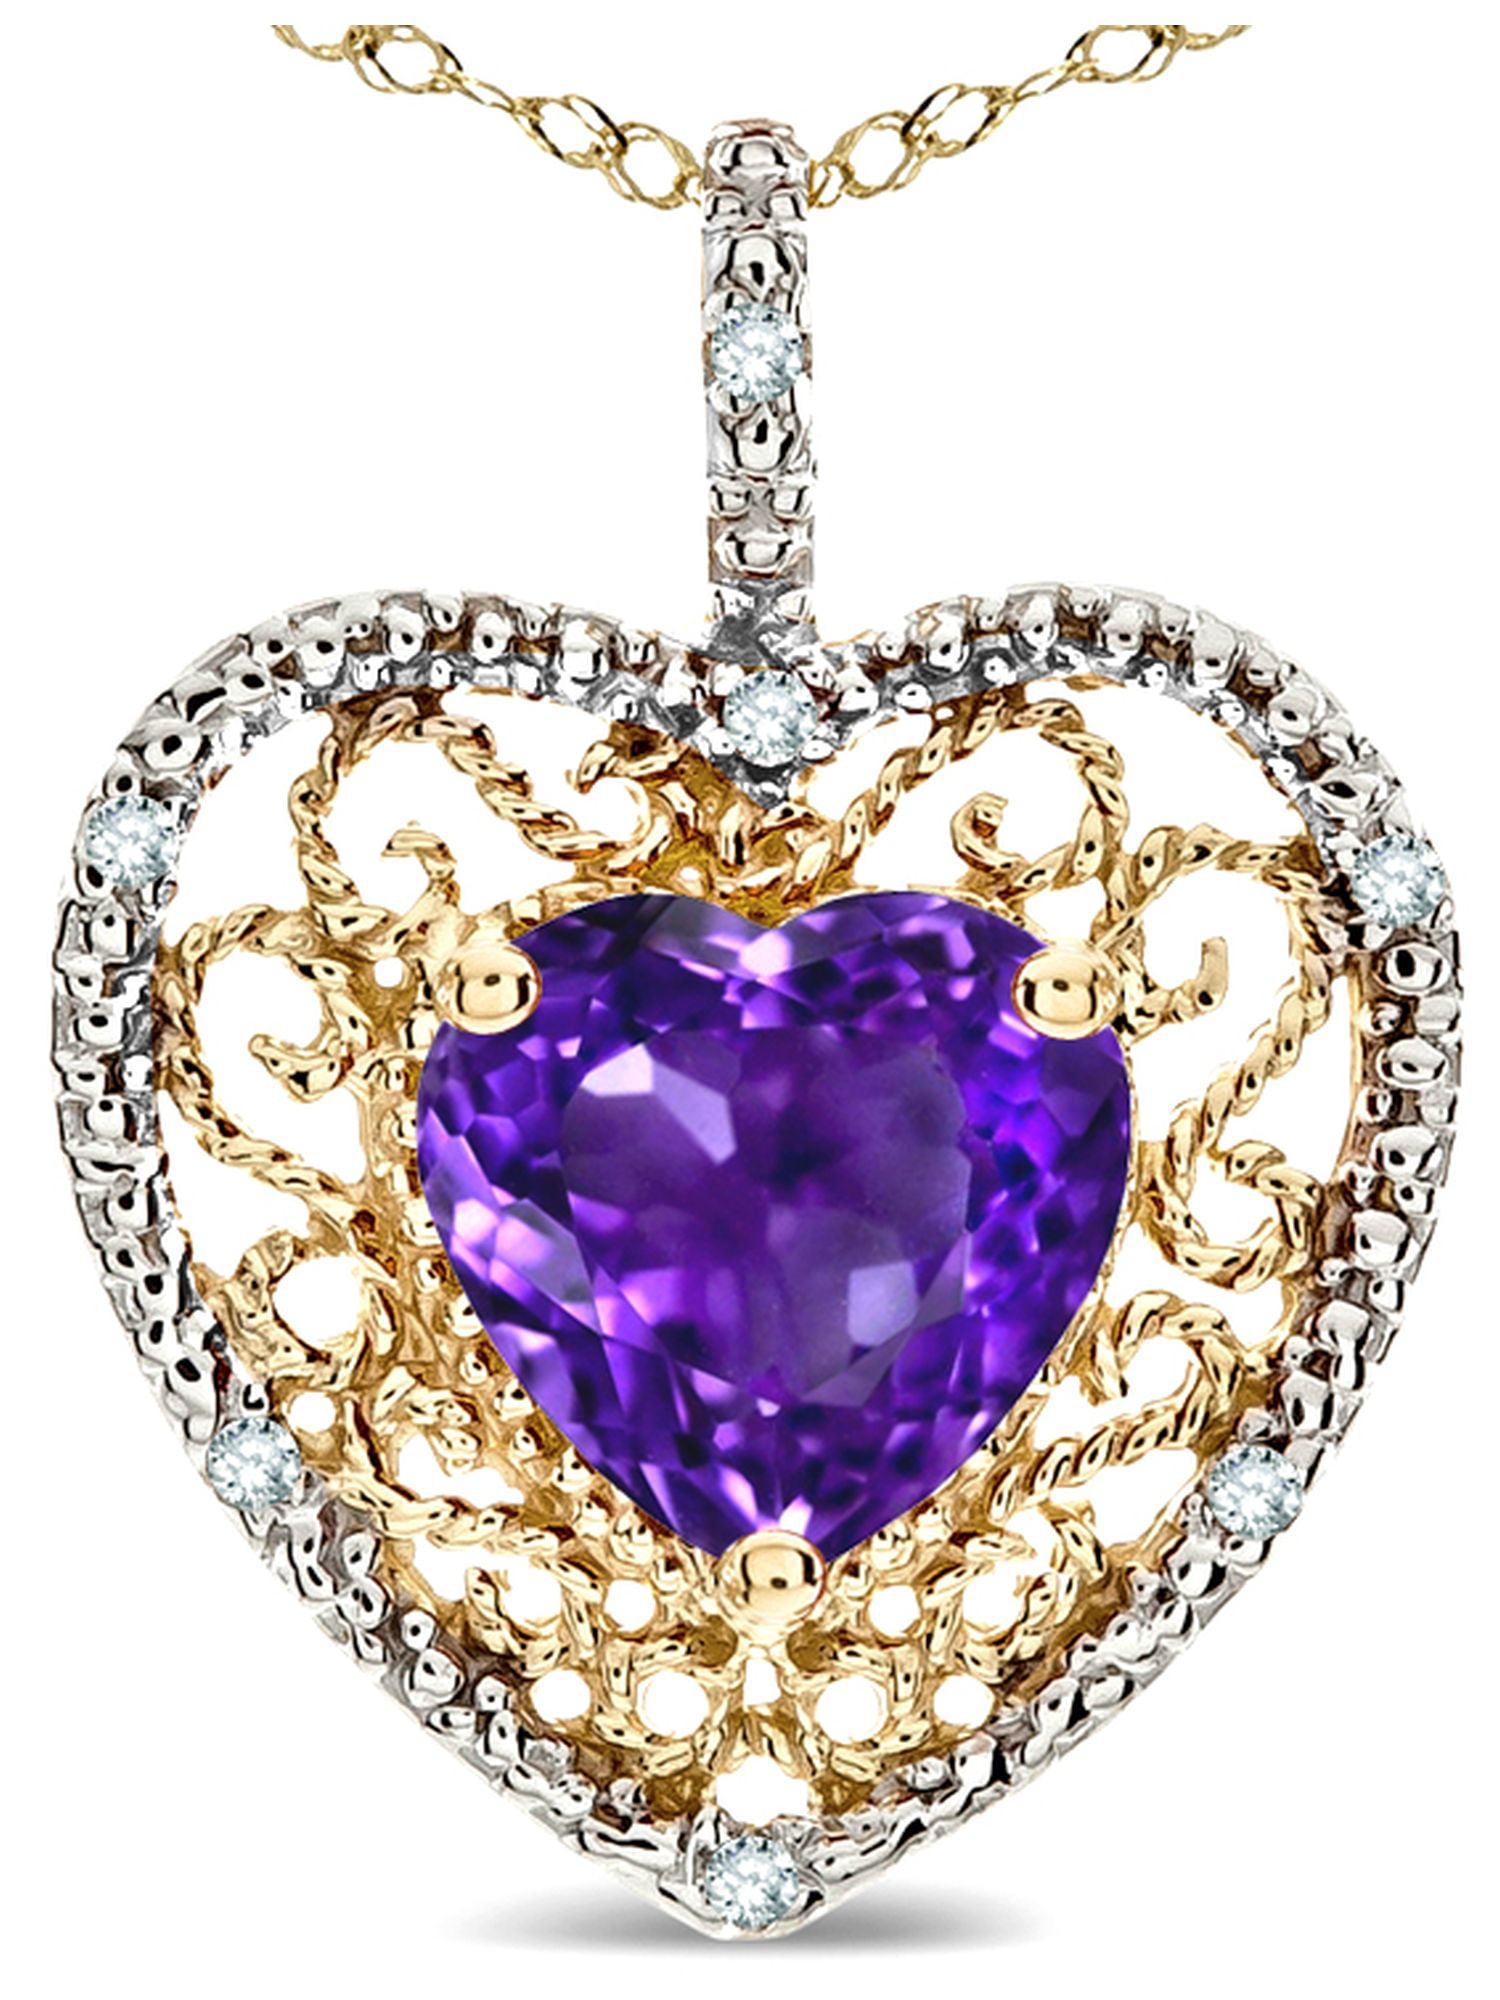 Star K Heart Shape 8mm Genuine Amethyst filigree Heart Pendant Necklace 10k Yellow Gold by Star K